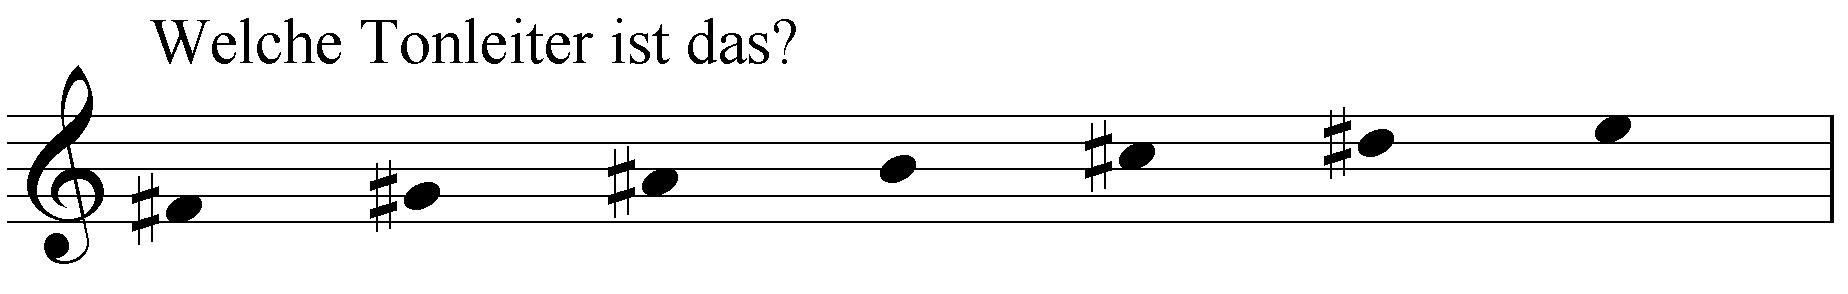 Welche Tonleiter ist das: fis gis ais b cis dis e?